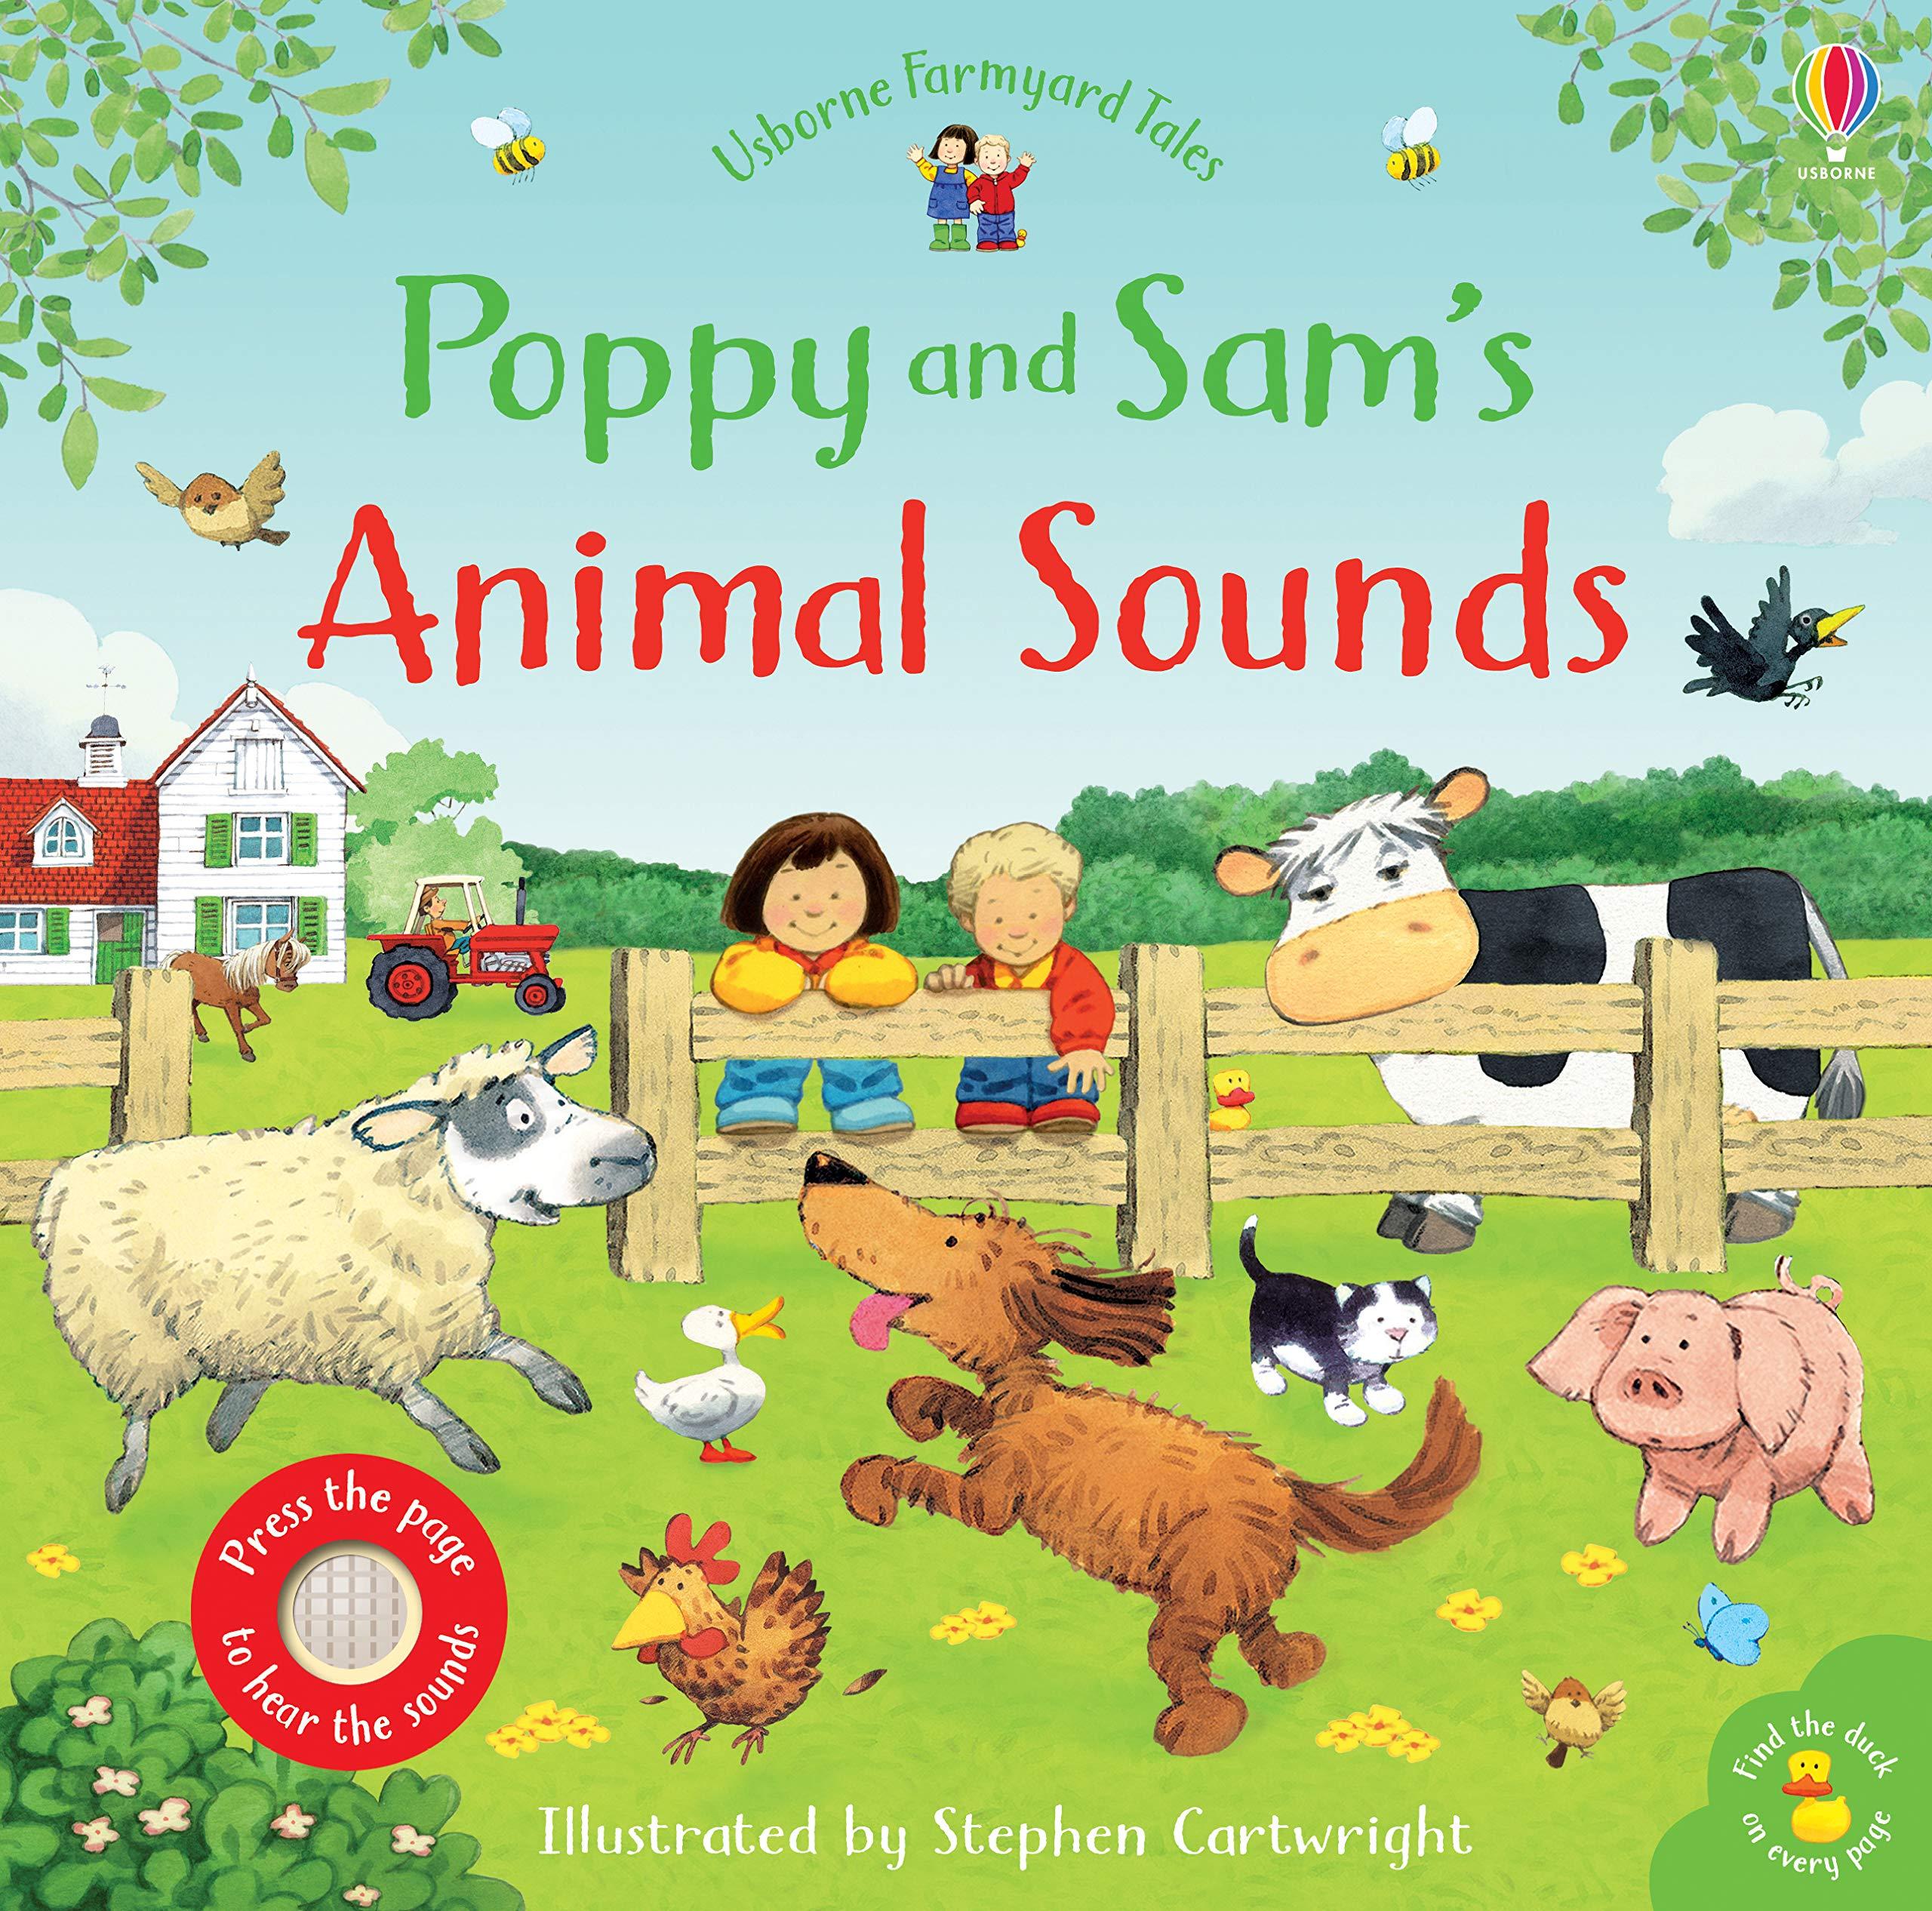 Poppy and Sam's Animal Sounds Farmyard Tales Poppy and Sam: Amazon.co.uk: Sam Taplin, Stephen Cartwright, Stephen Cartwright: Books